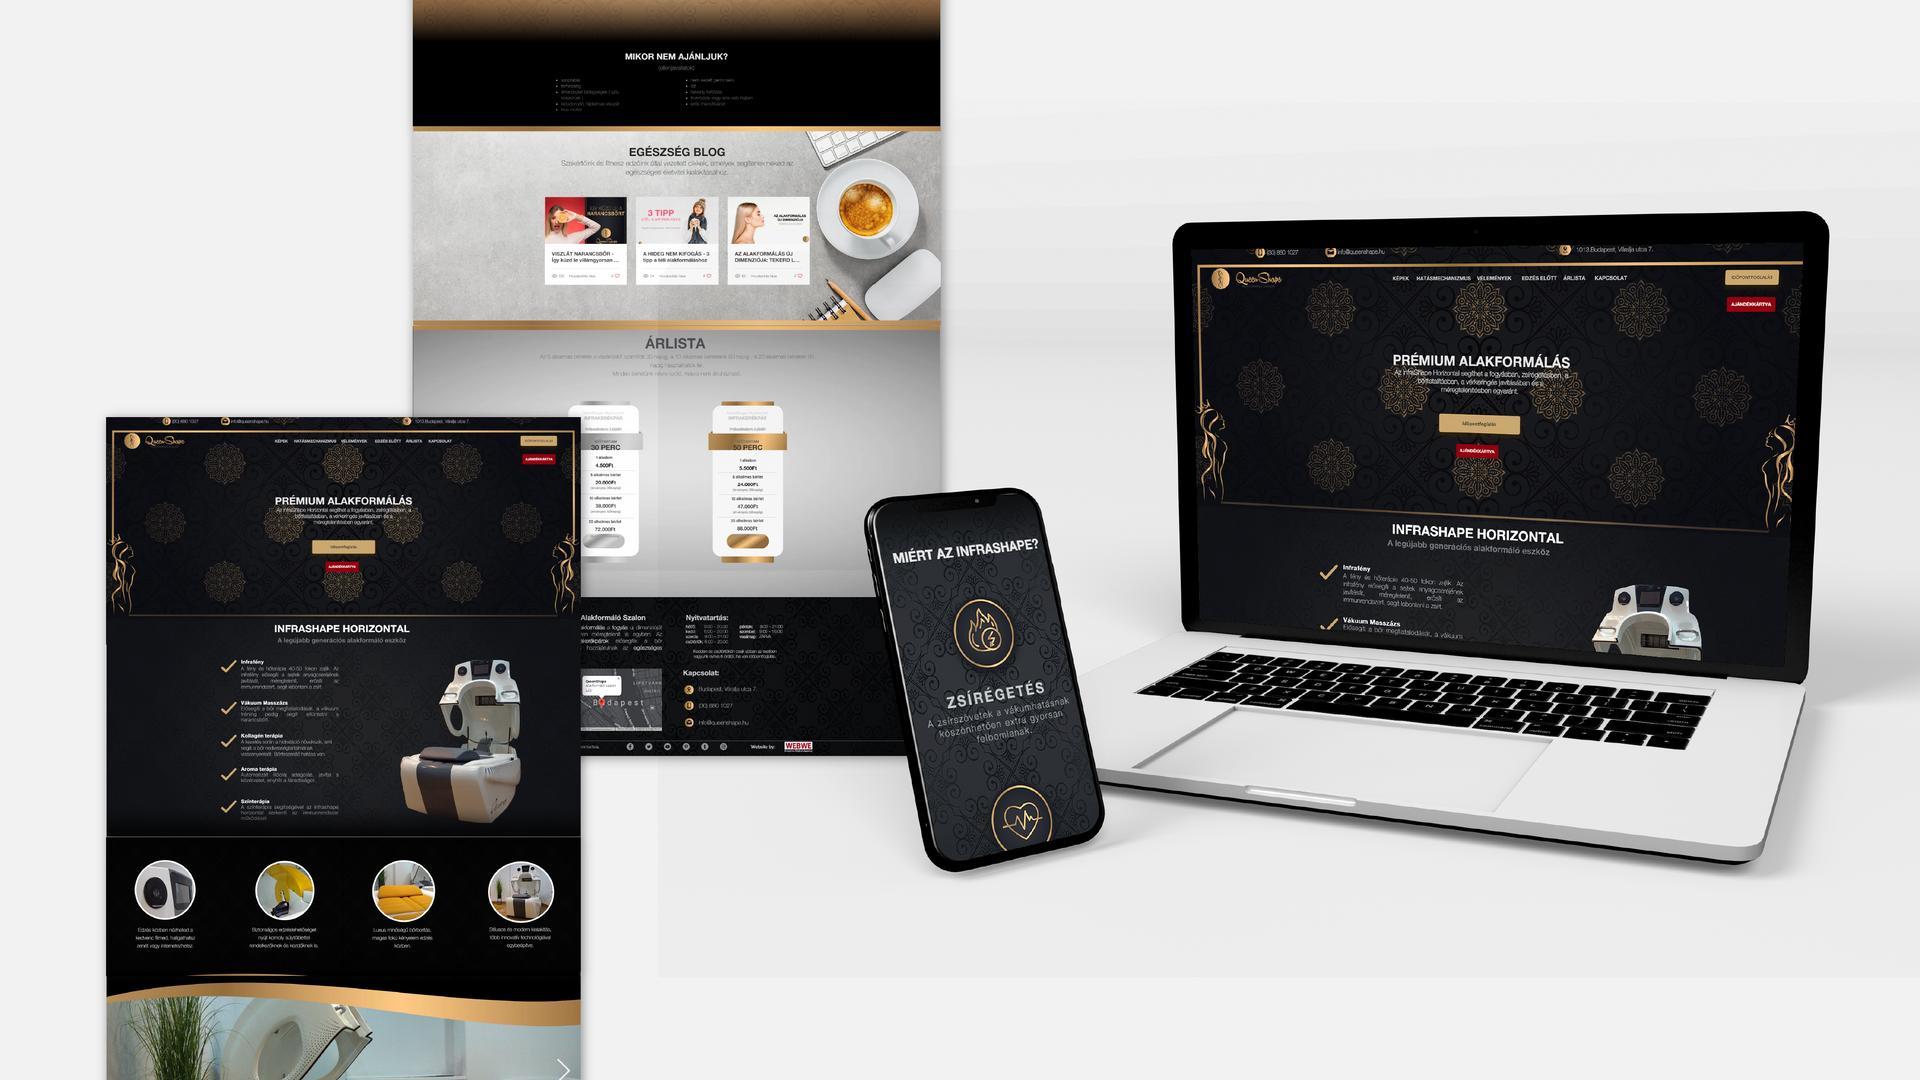 QueenShape | Időpontfoglaló oldal & shop